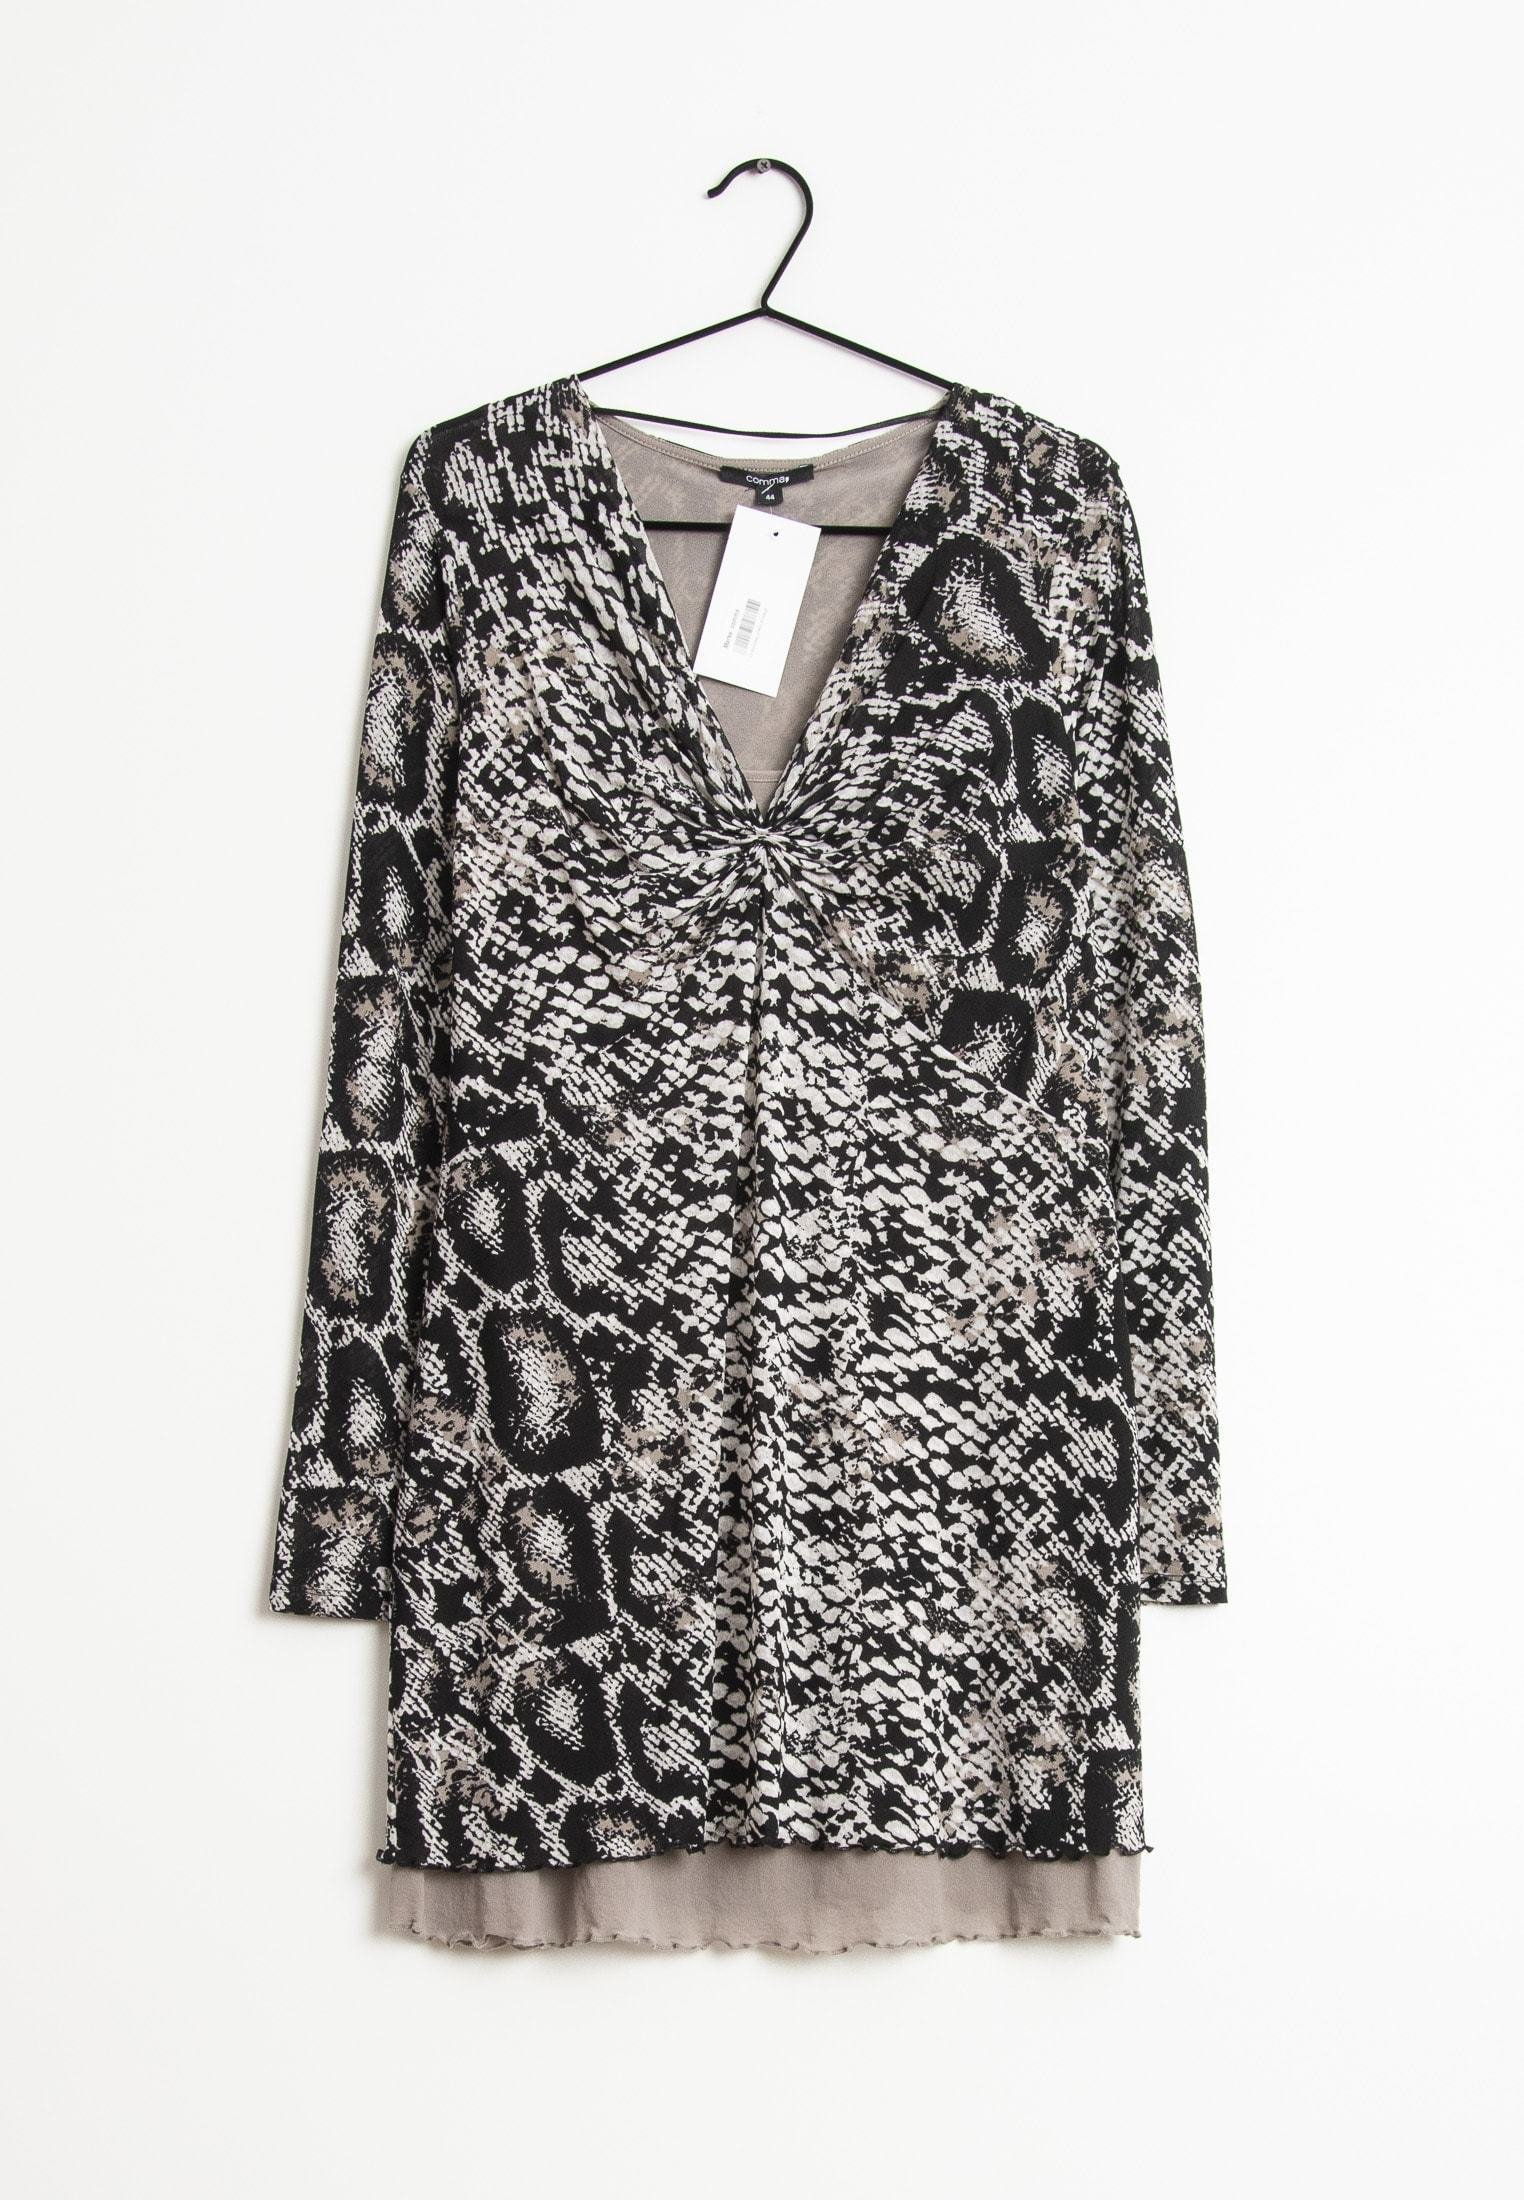 comma kleding voor dames kopen Vind jouw comma kleding